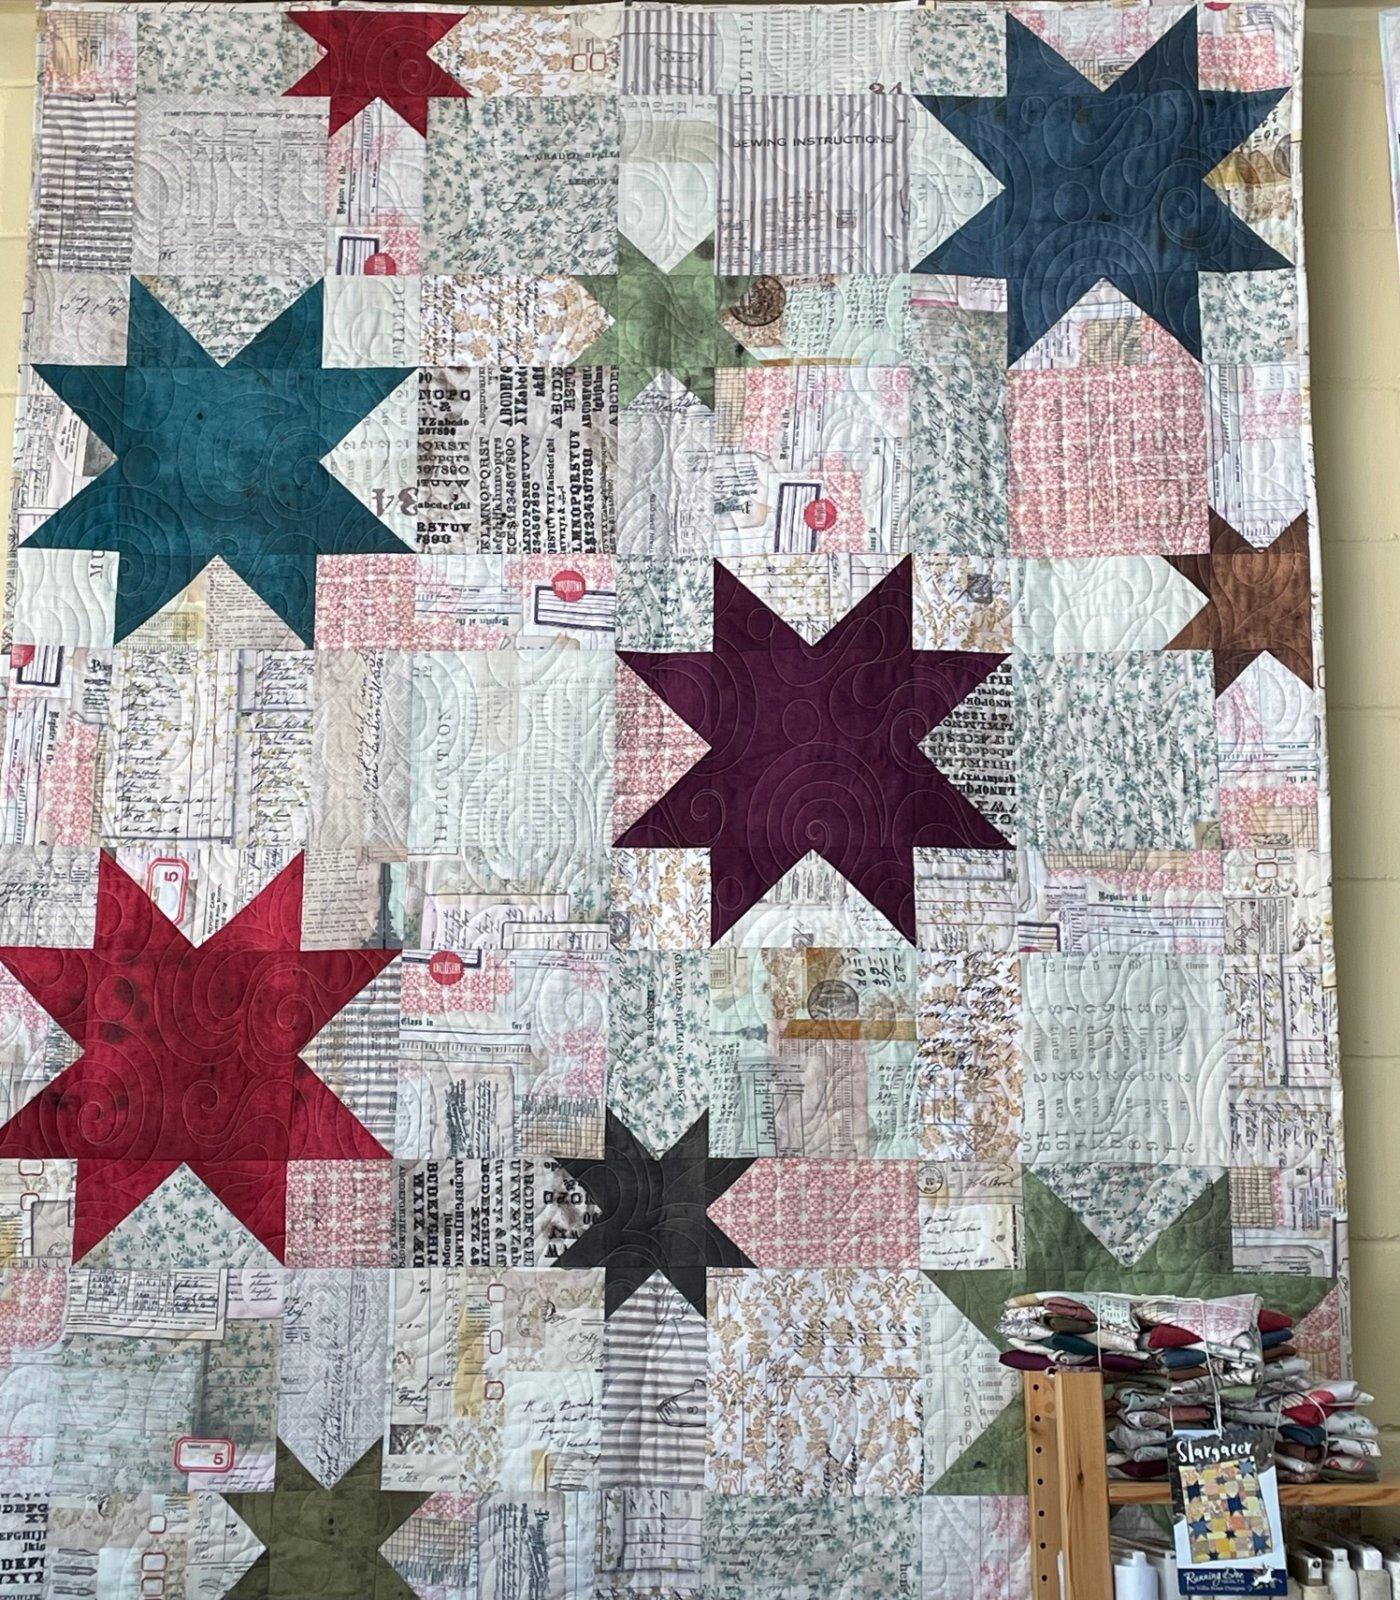 Stargazer - Tim Holtz fabrics + pattern